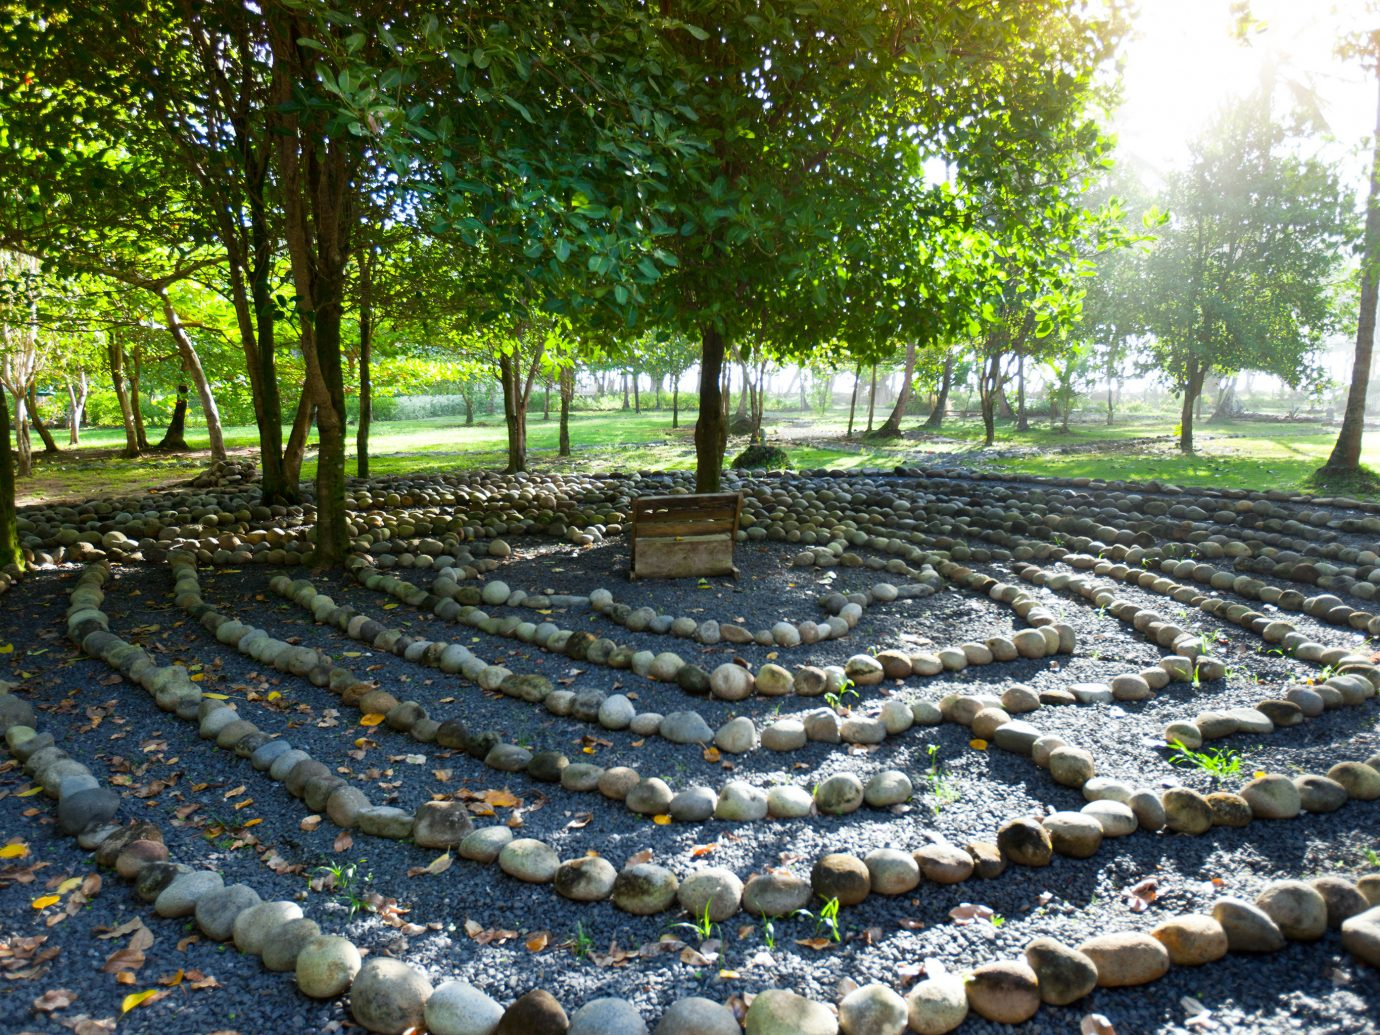 Eco Grounds Rustic Trip Ideas Wellness tree outdoor Garden yard outdoor structure backyard lawn plantation flower